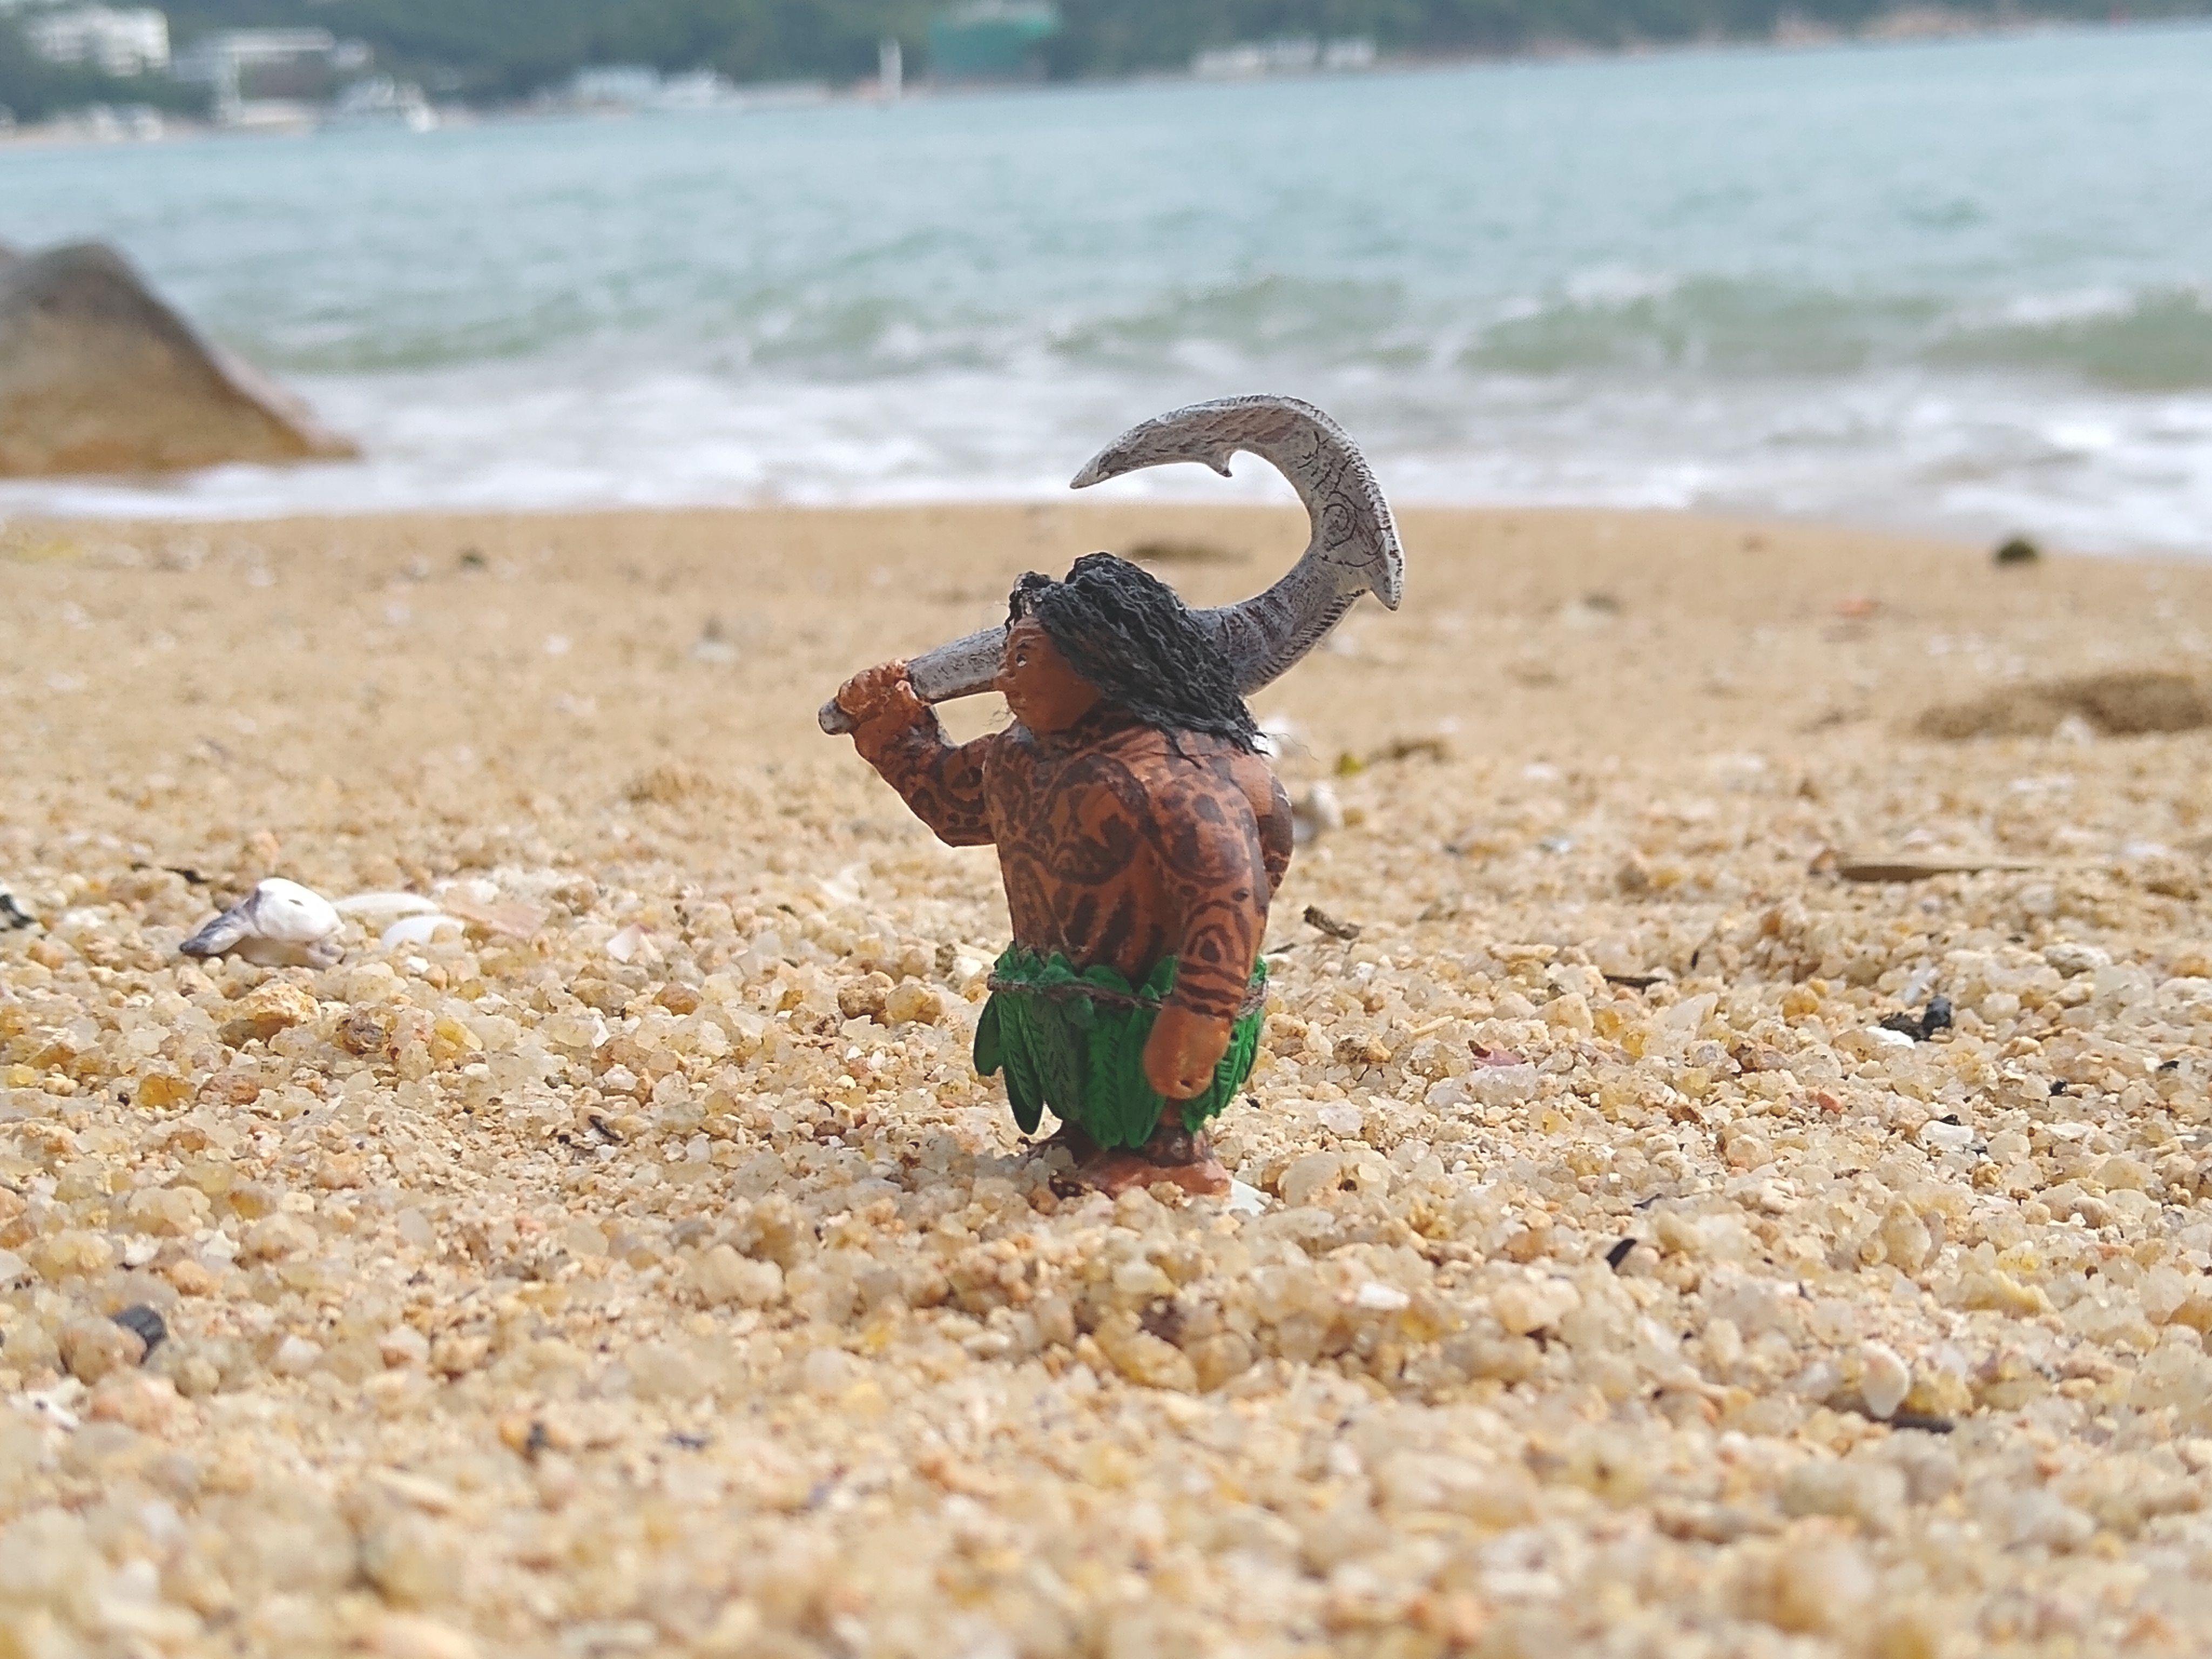 Disney, Dragon, Dungeons, Dungeons And Dragons, Maui, Mini, Miniature, Moana, Sculpting, Sculpture